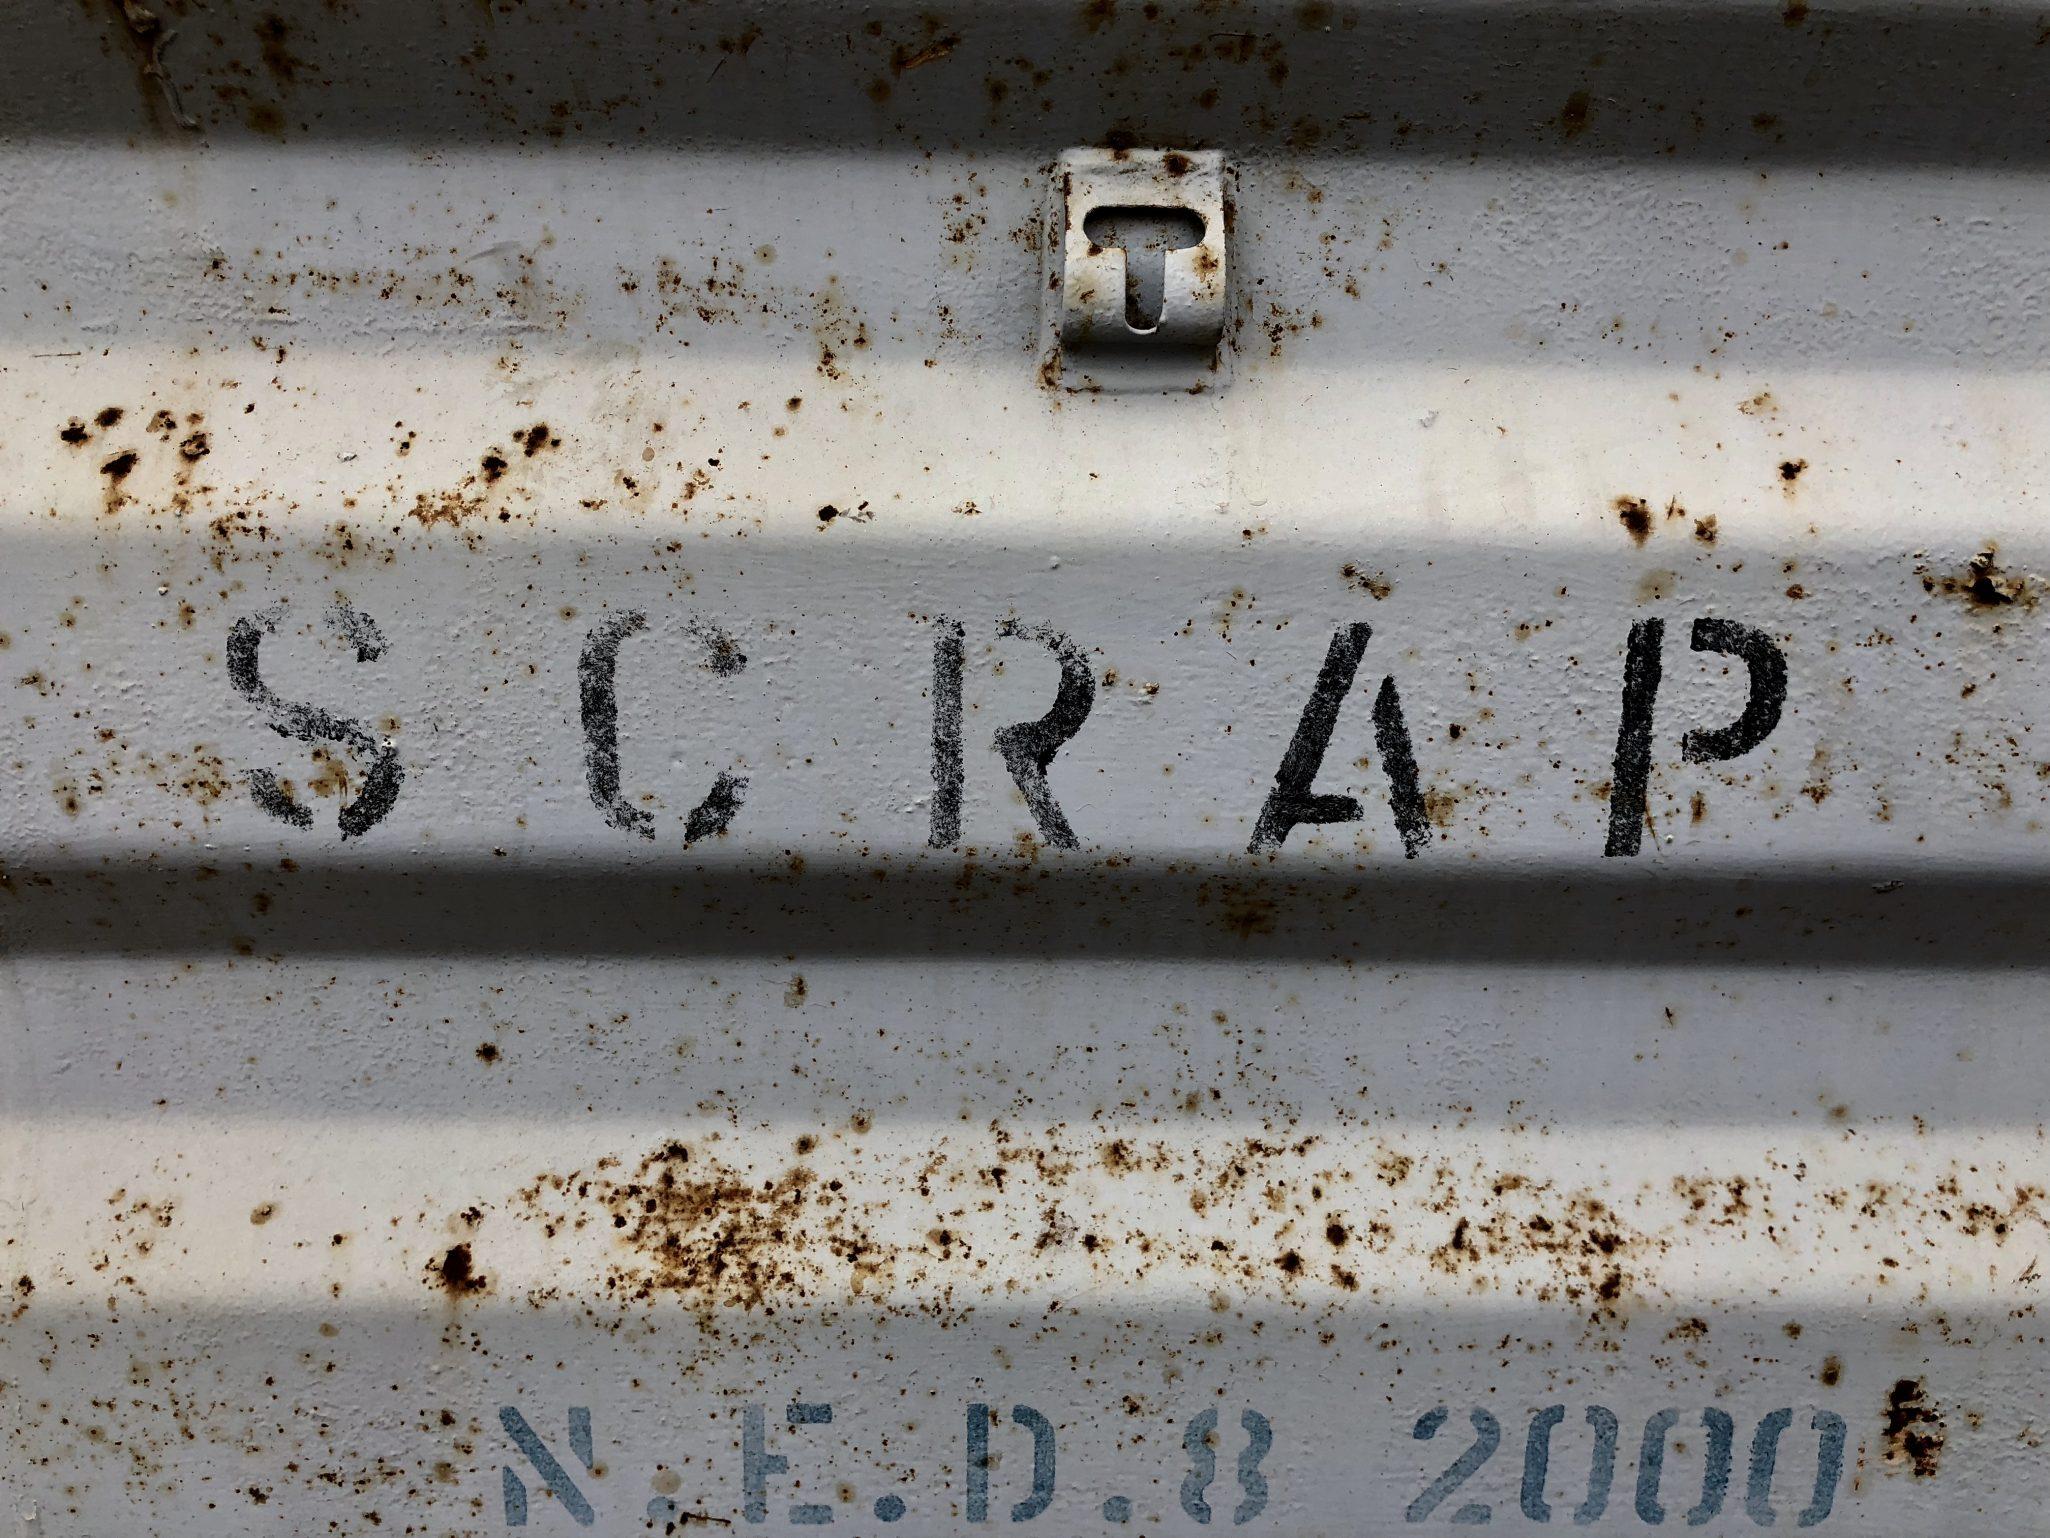 Boatbreakers Scrappage Scheme 2018